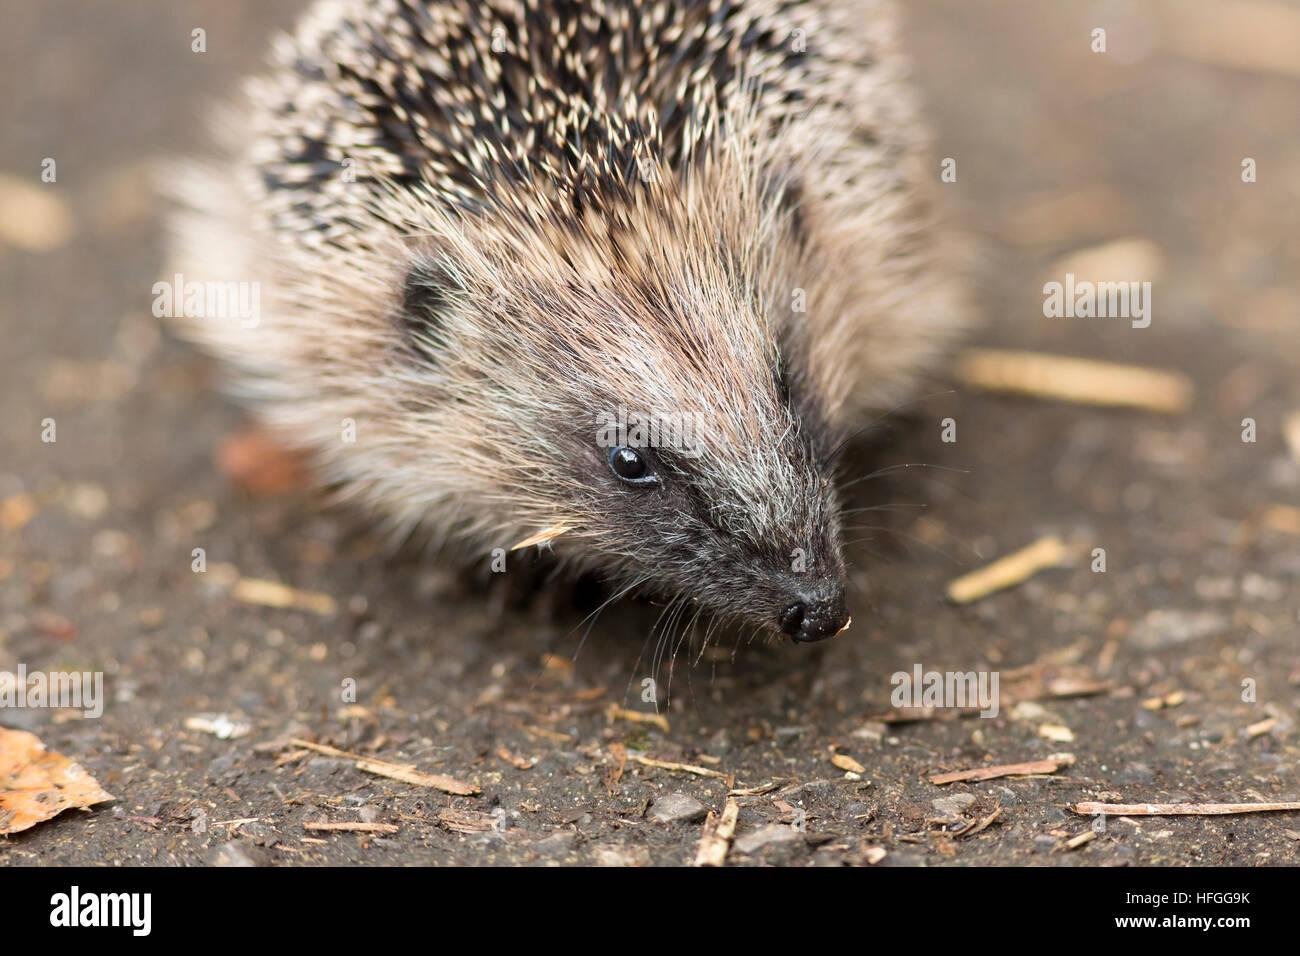 juvenile hedgehog close up - Stock Image